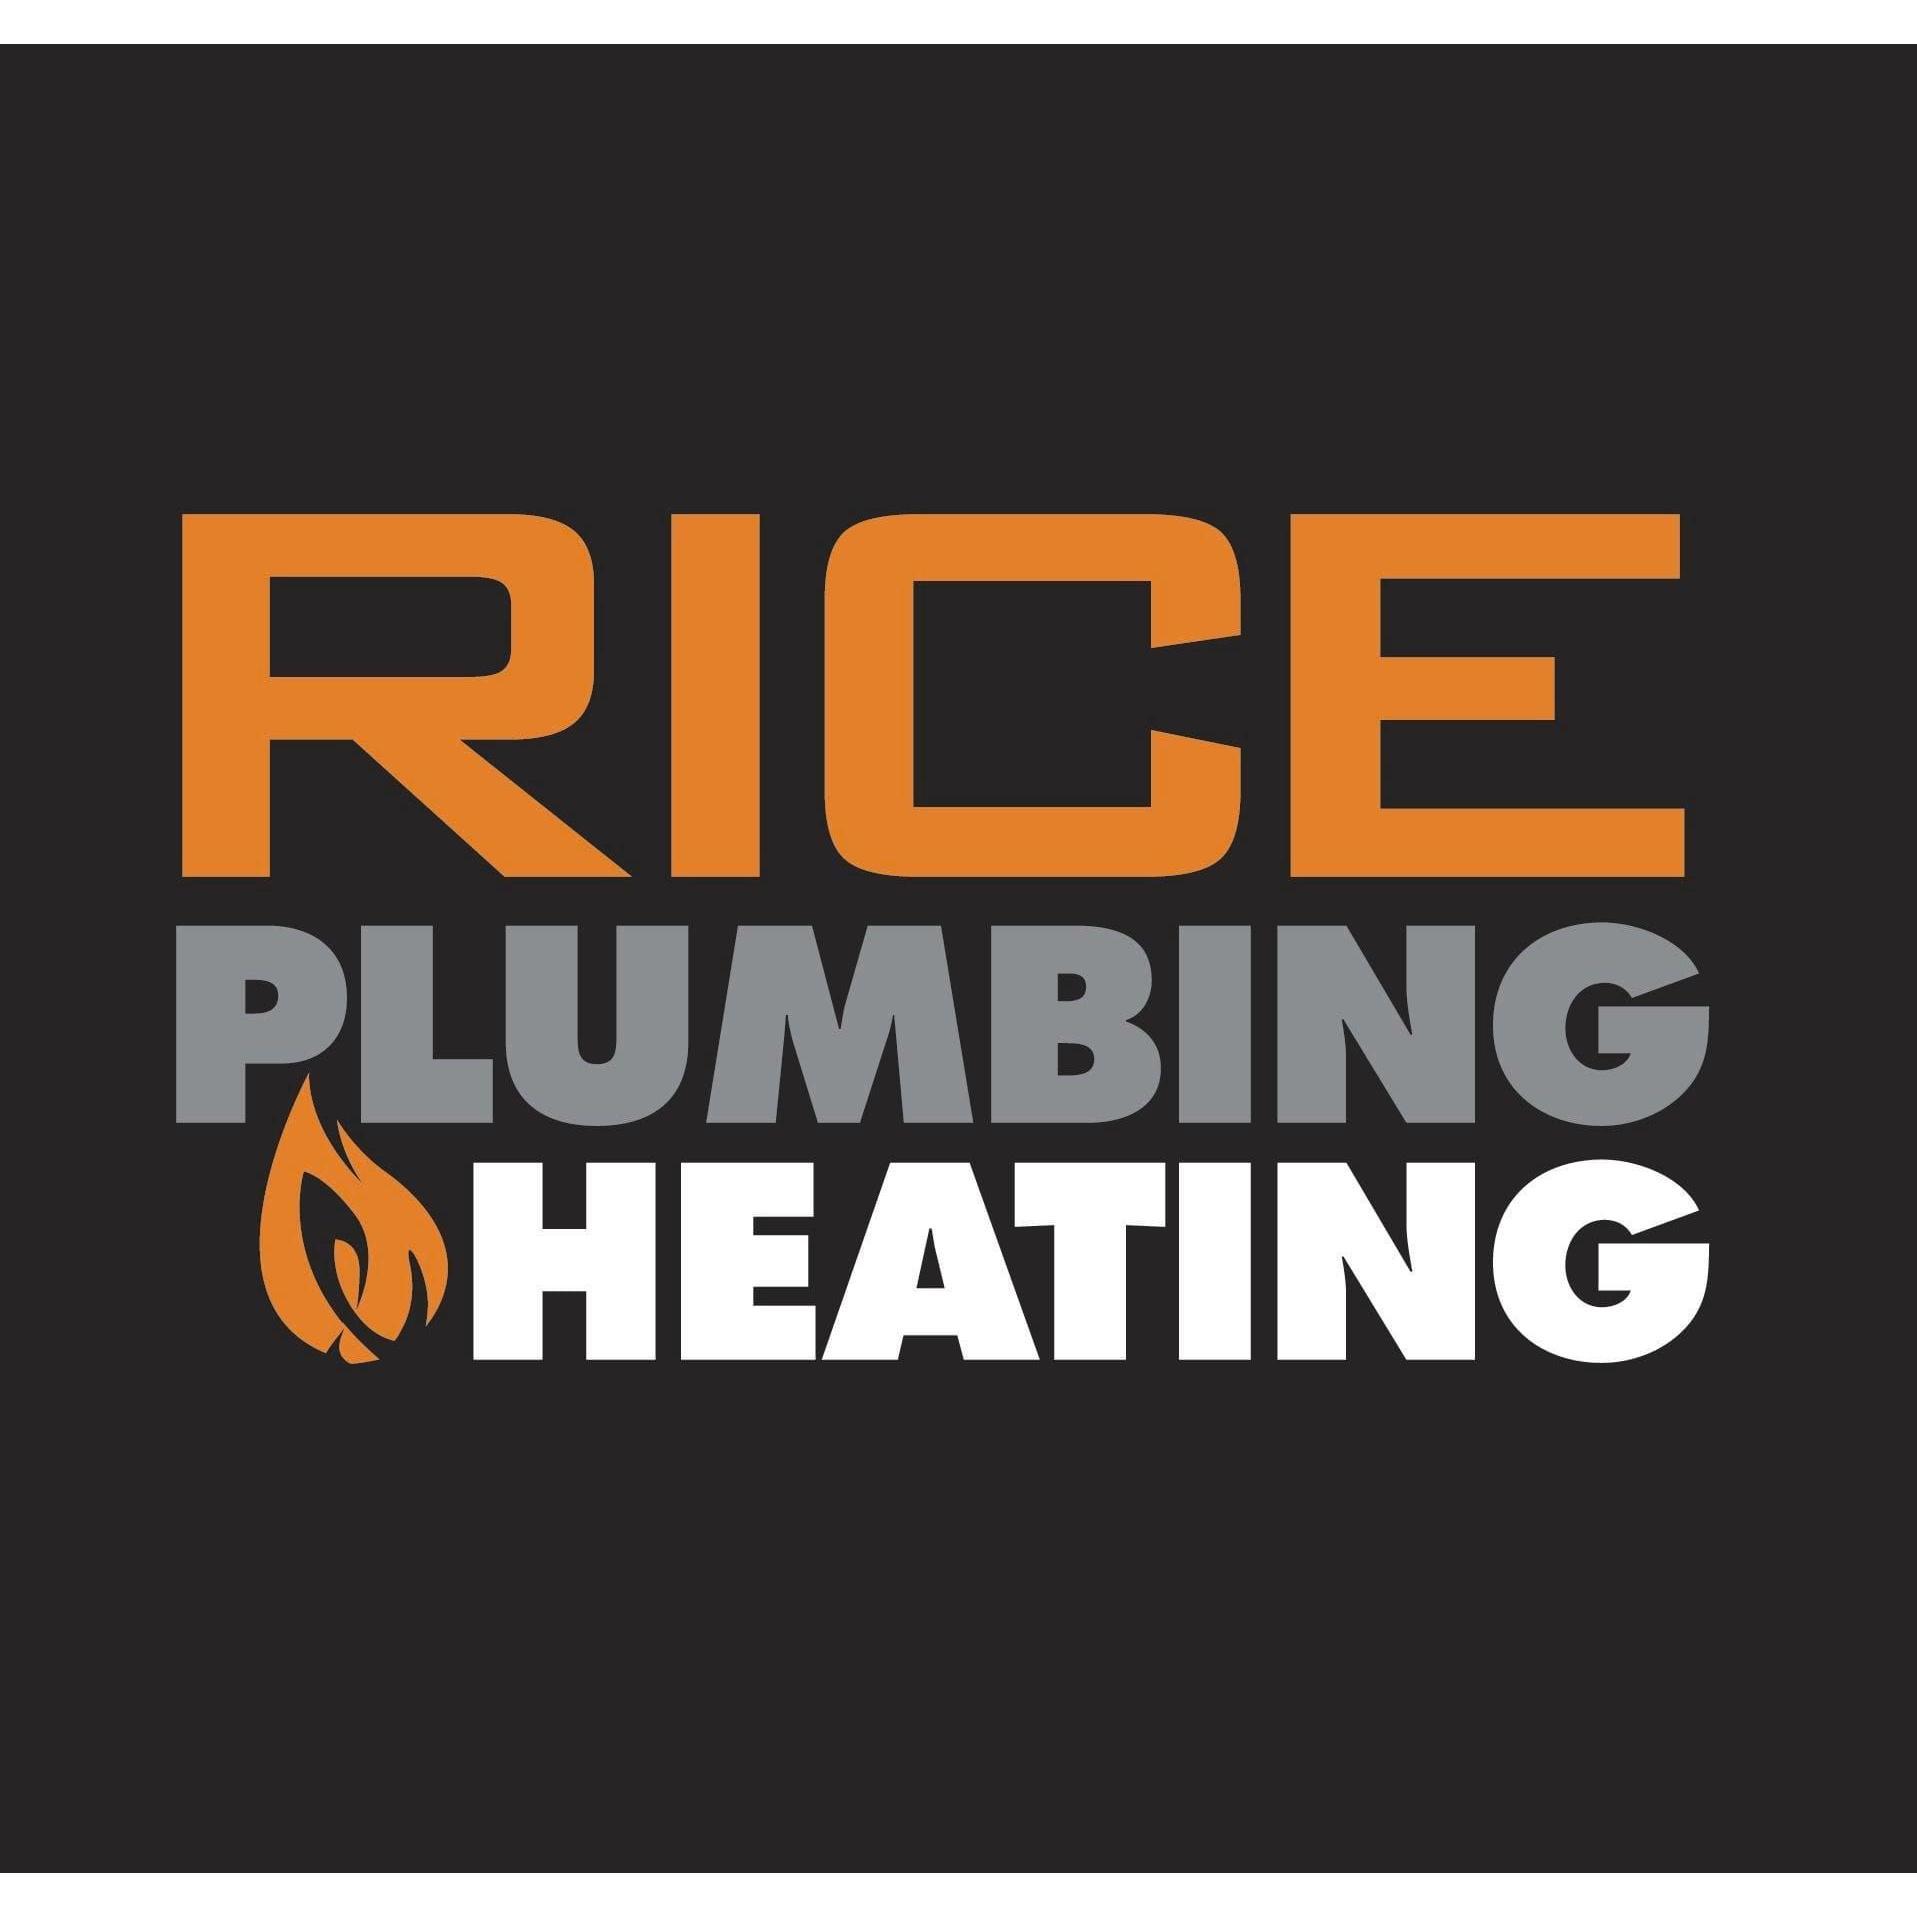 Rice Plumbing & Heating - Ammanford, Dyfed SA18 2HX - 01269 595840 | ShowMeLocal.com